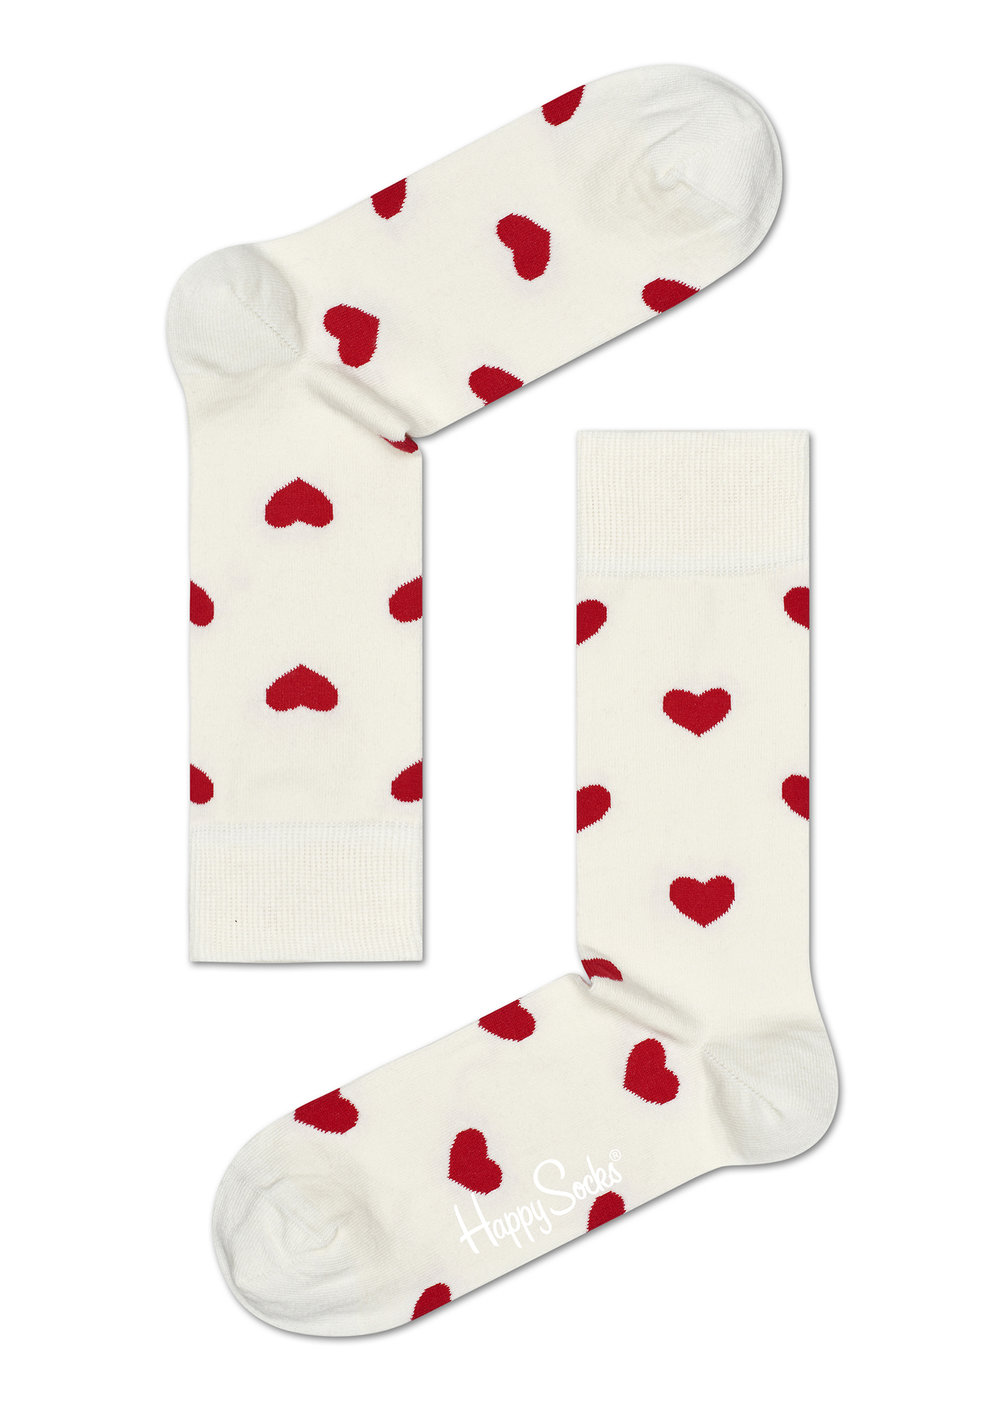 Happy Socks לסטורי, 49₪